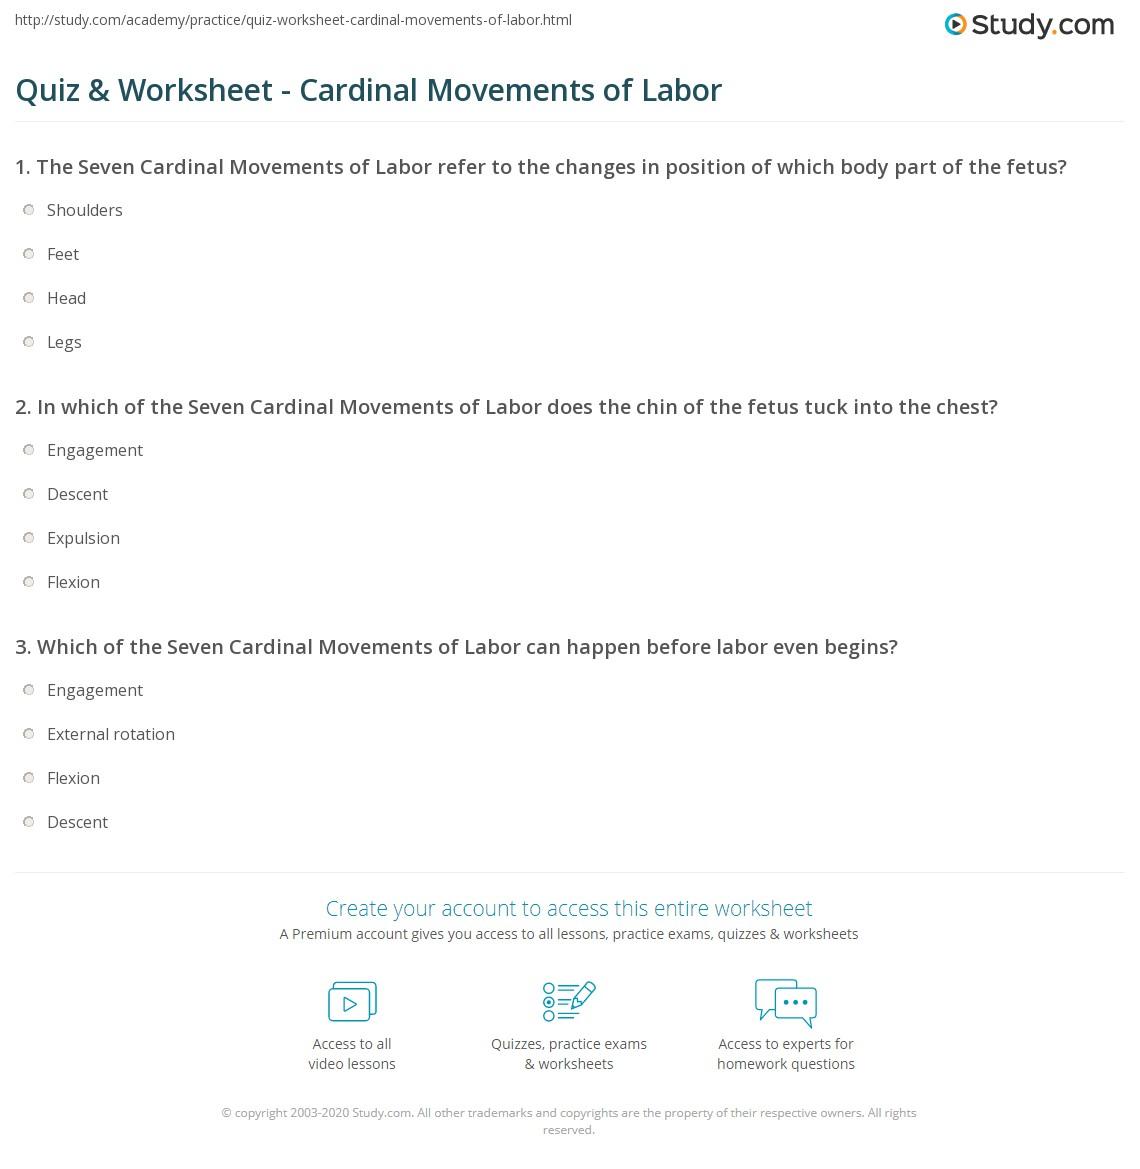 Quiz & Worksheet - Cardinal Movements of Labor | Study.com